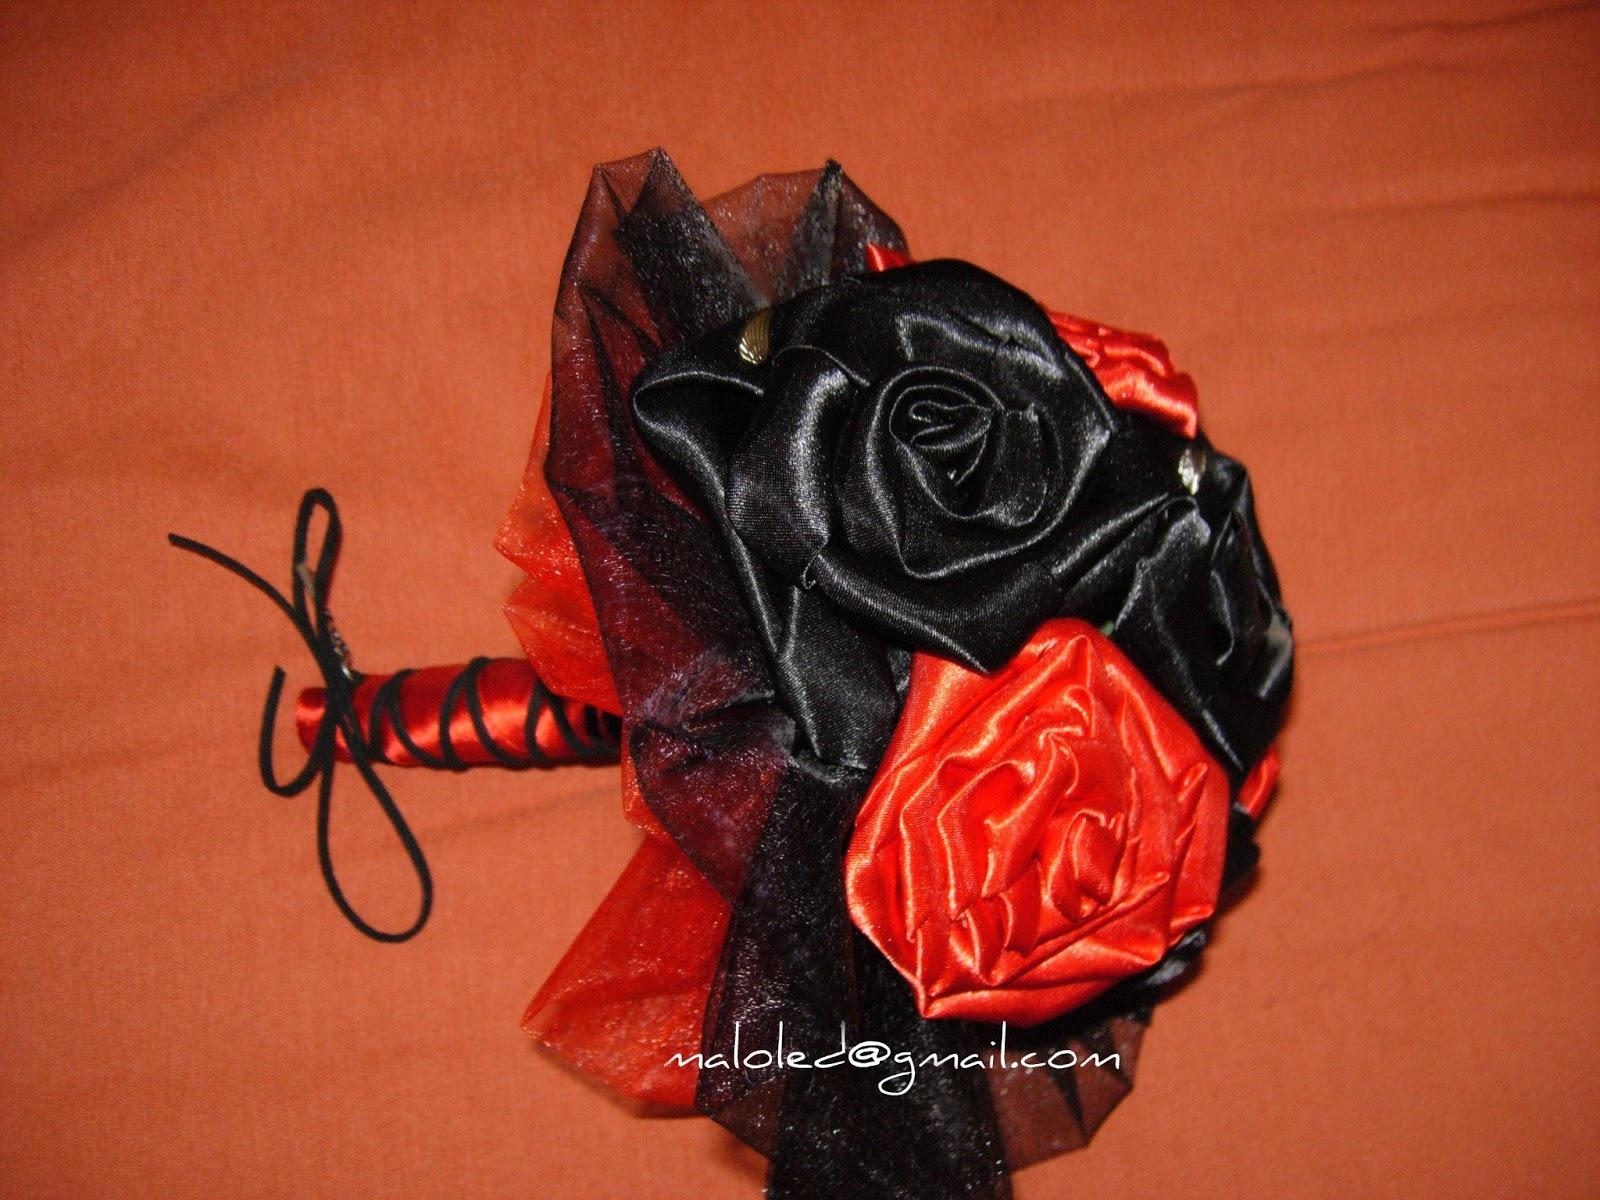 imajenes de ramos de rosas negras Mundo Imágenes